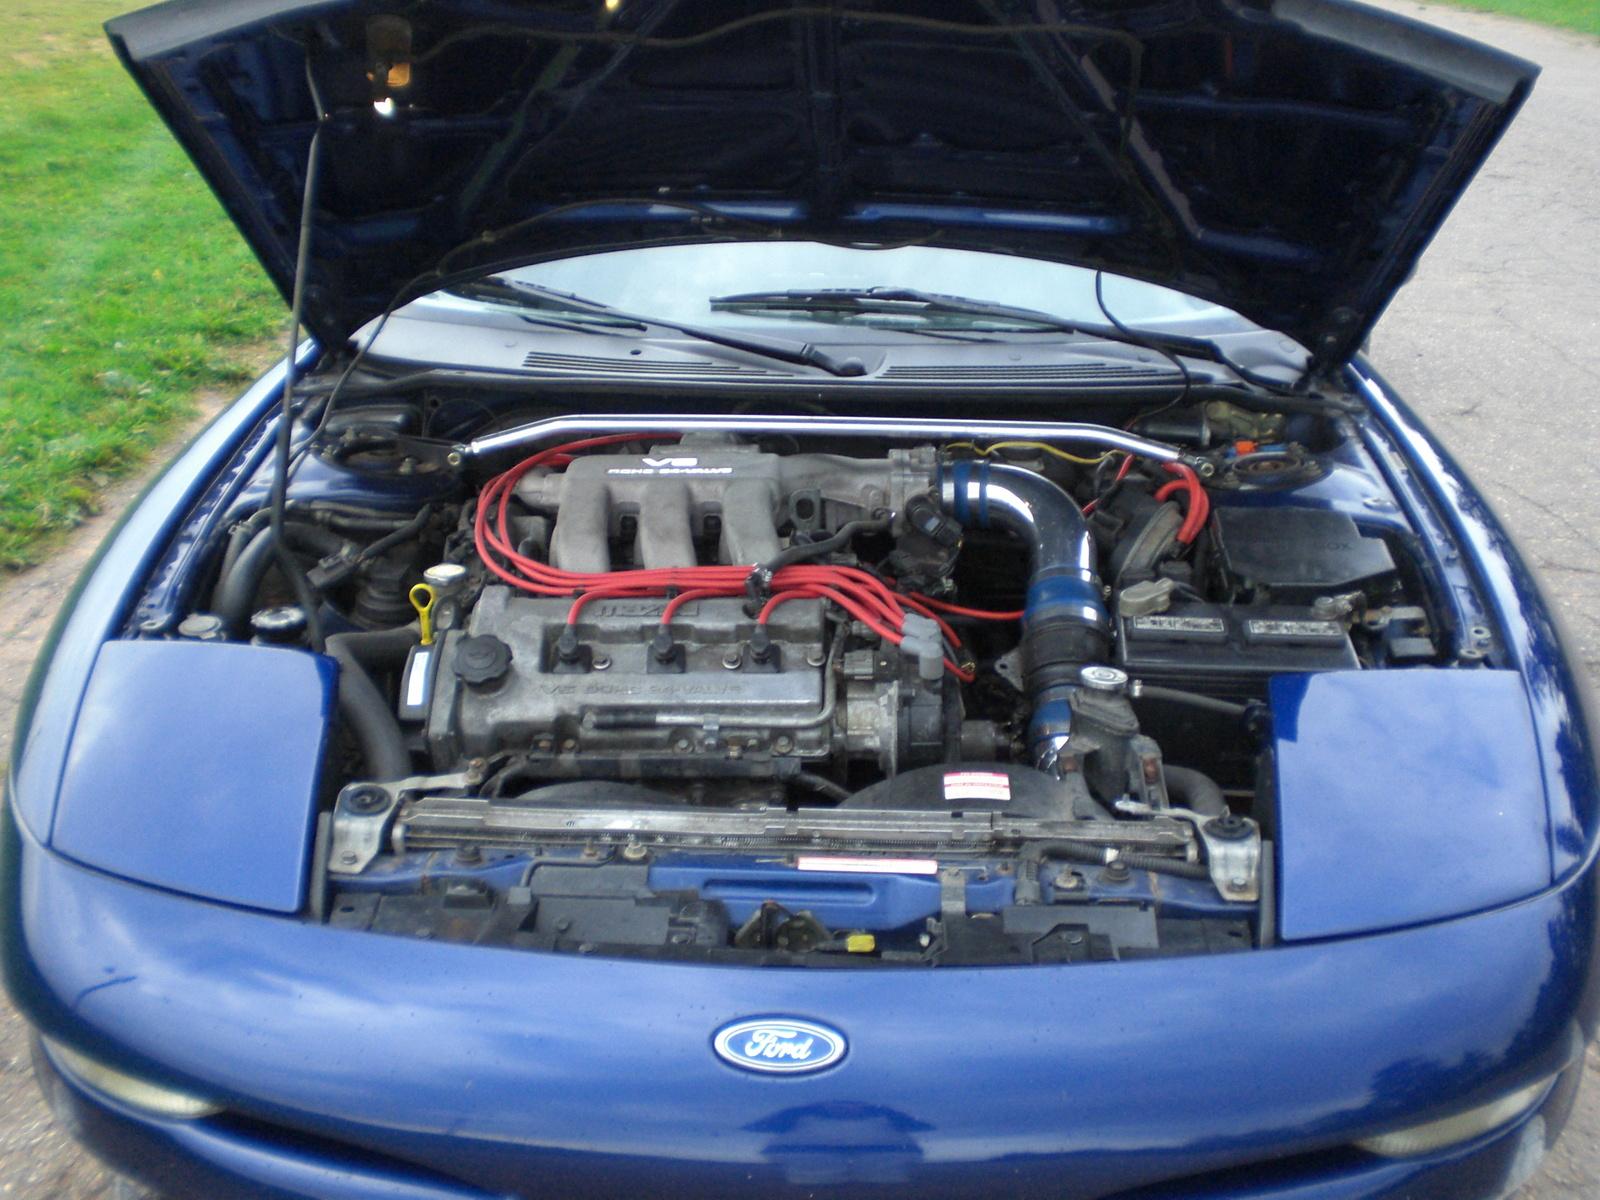 Ford Probe 1993 foto - 1